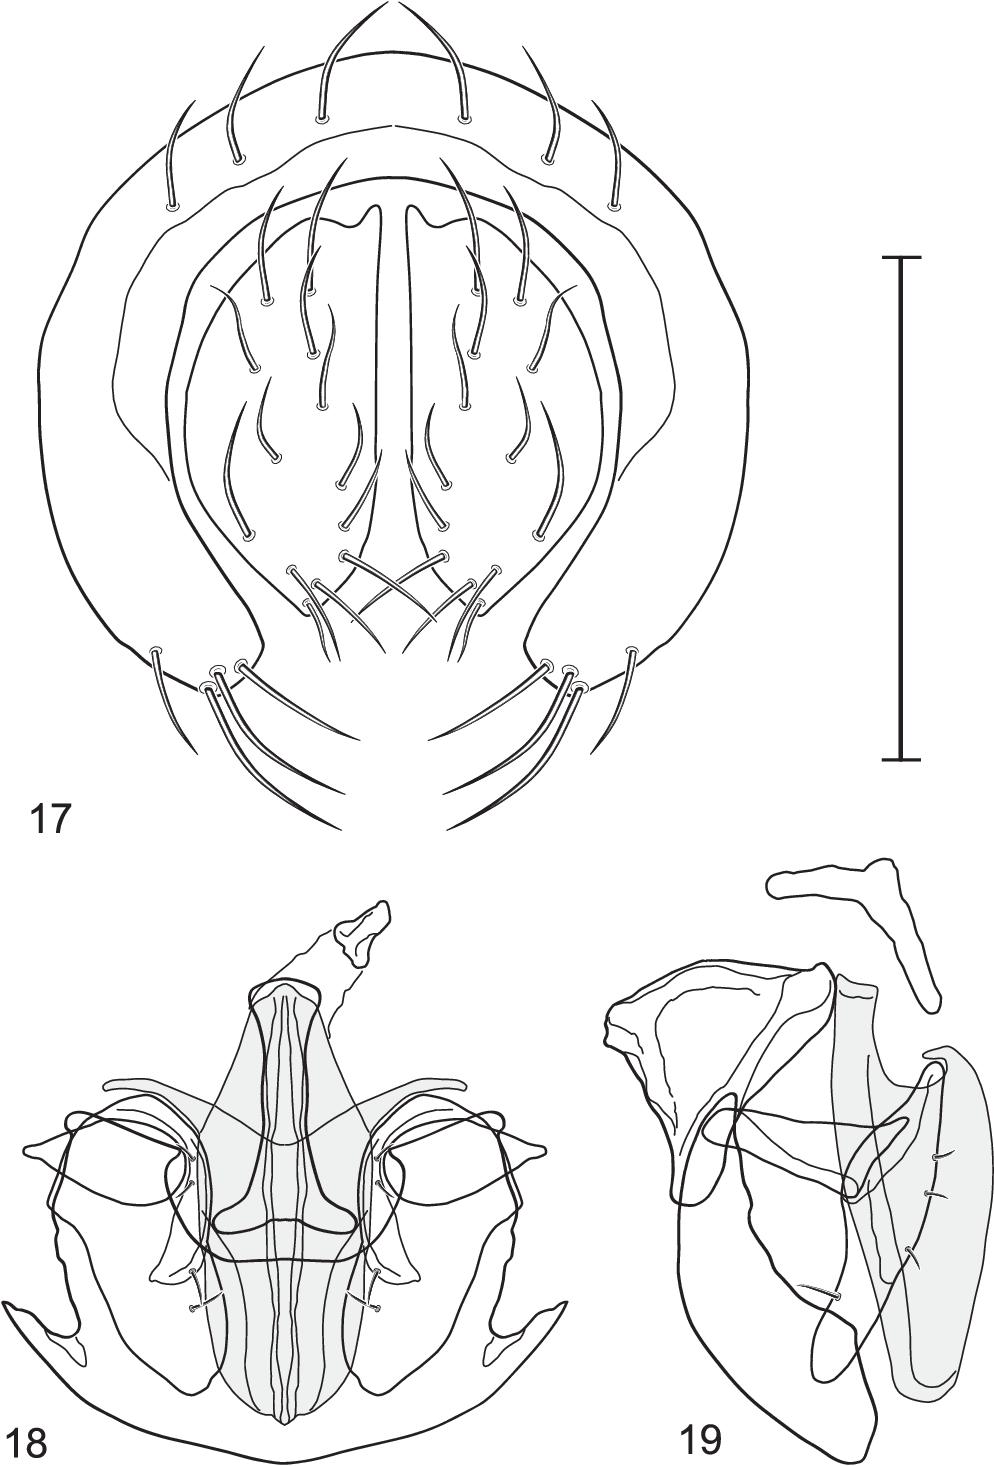 figure 17–19